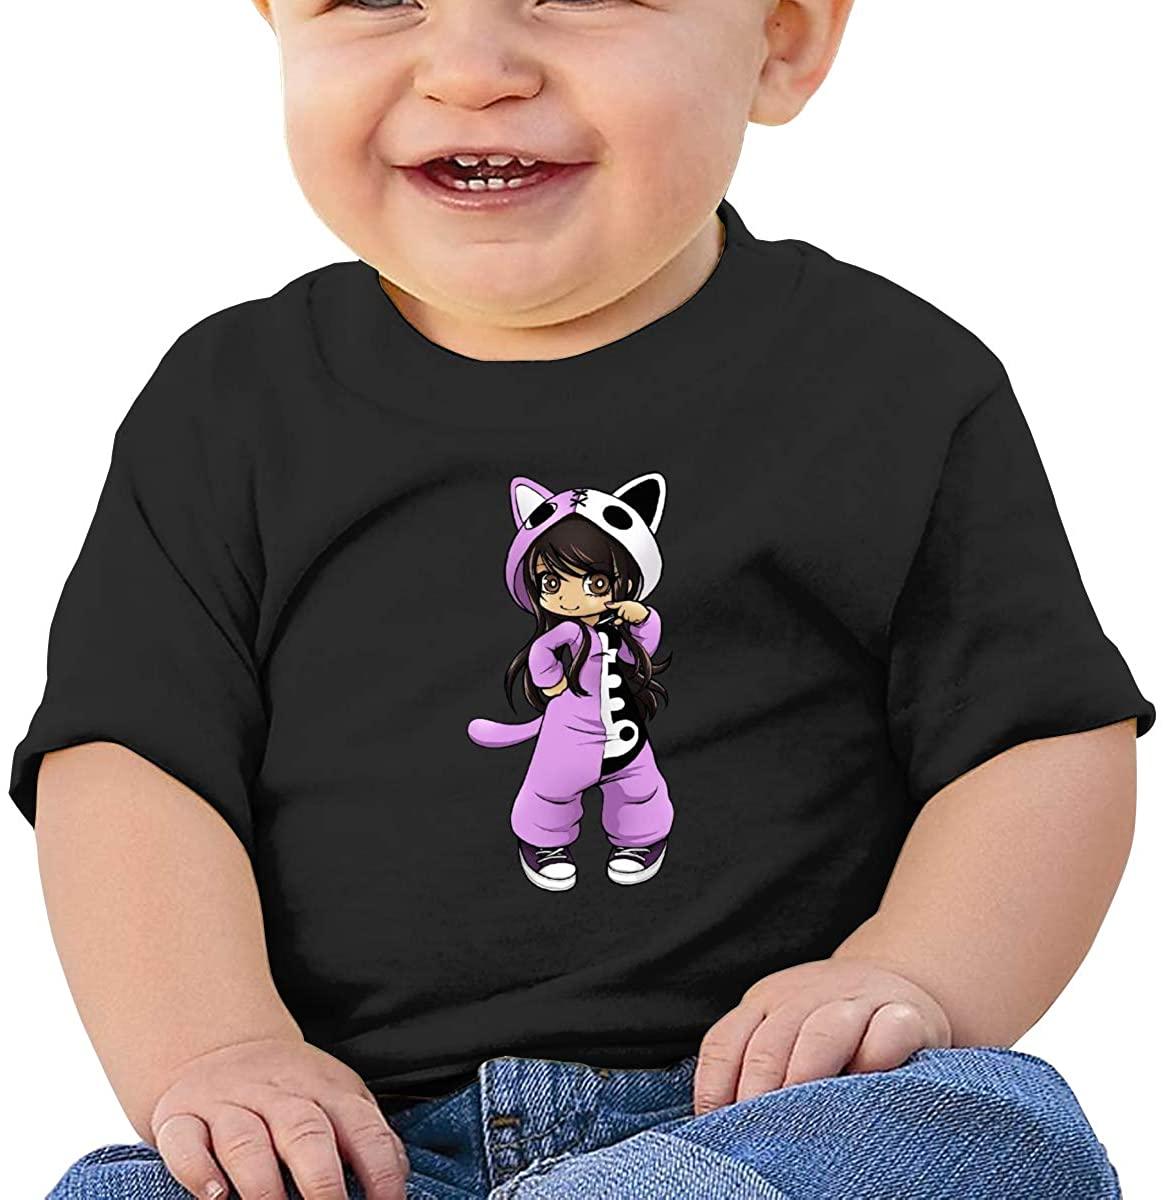 6-24 Months Boy and Girl Baby Short Sleeve T-Shirt Aphmau Logo Original Minimalist Style Black